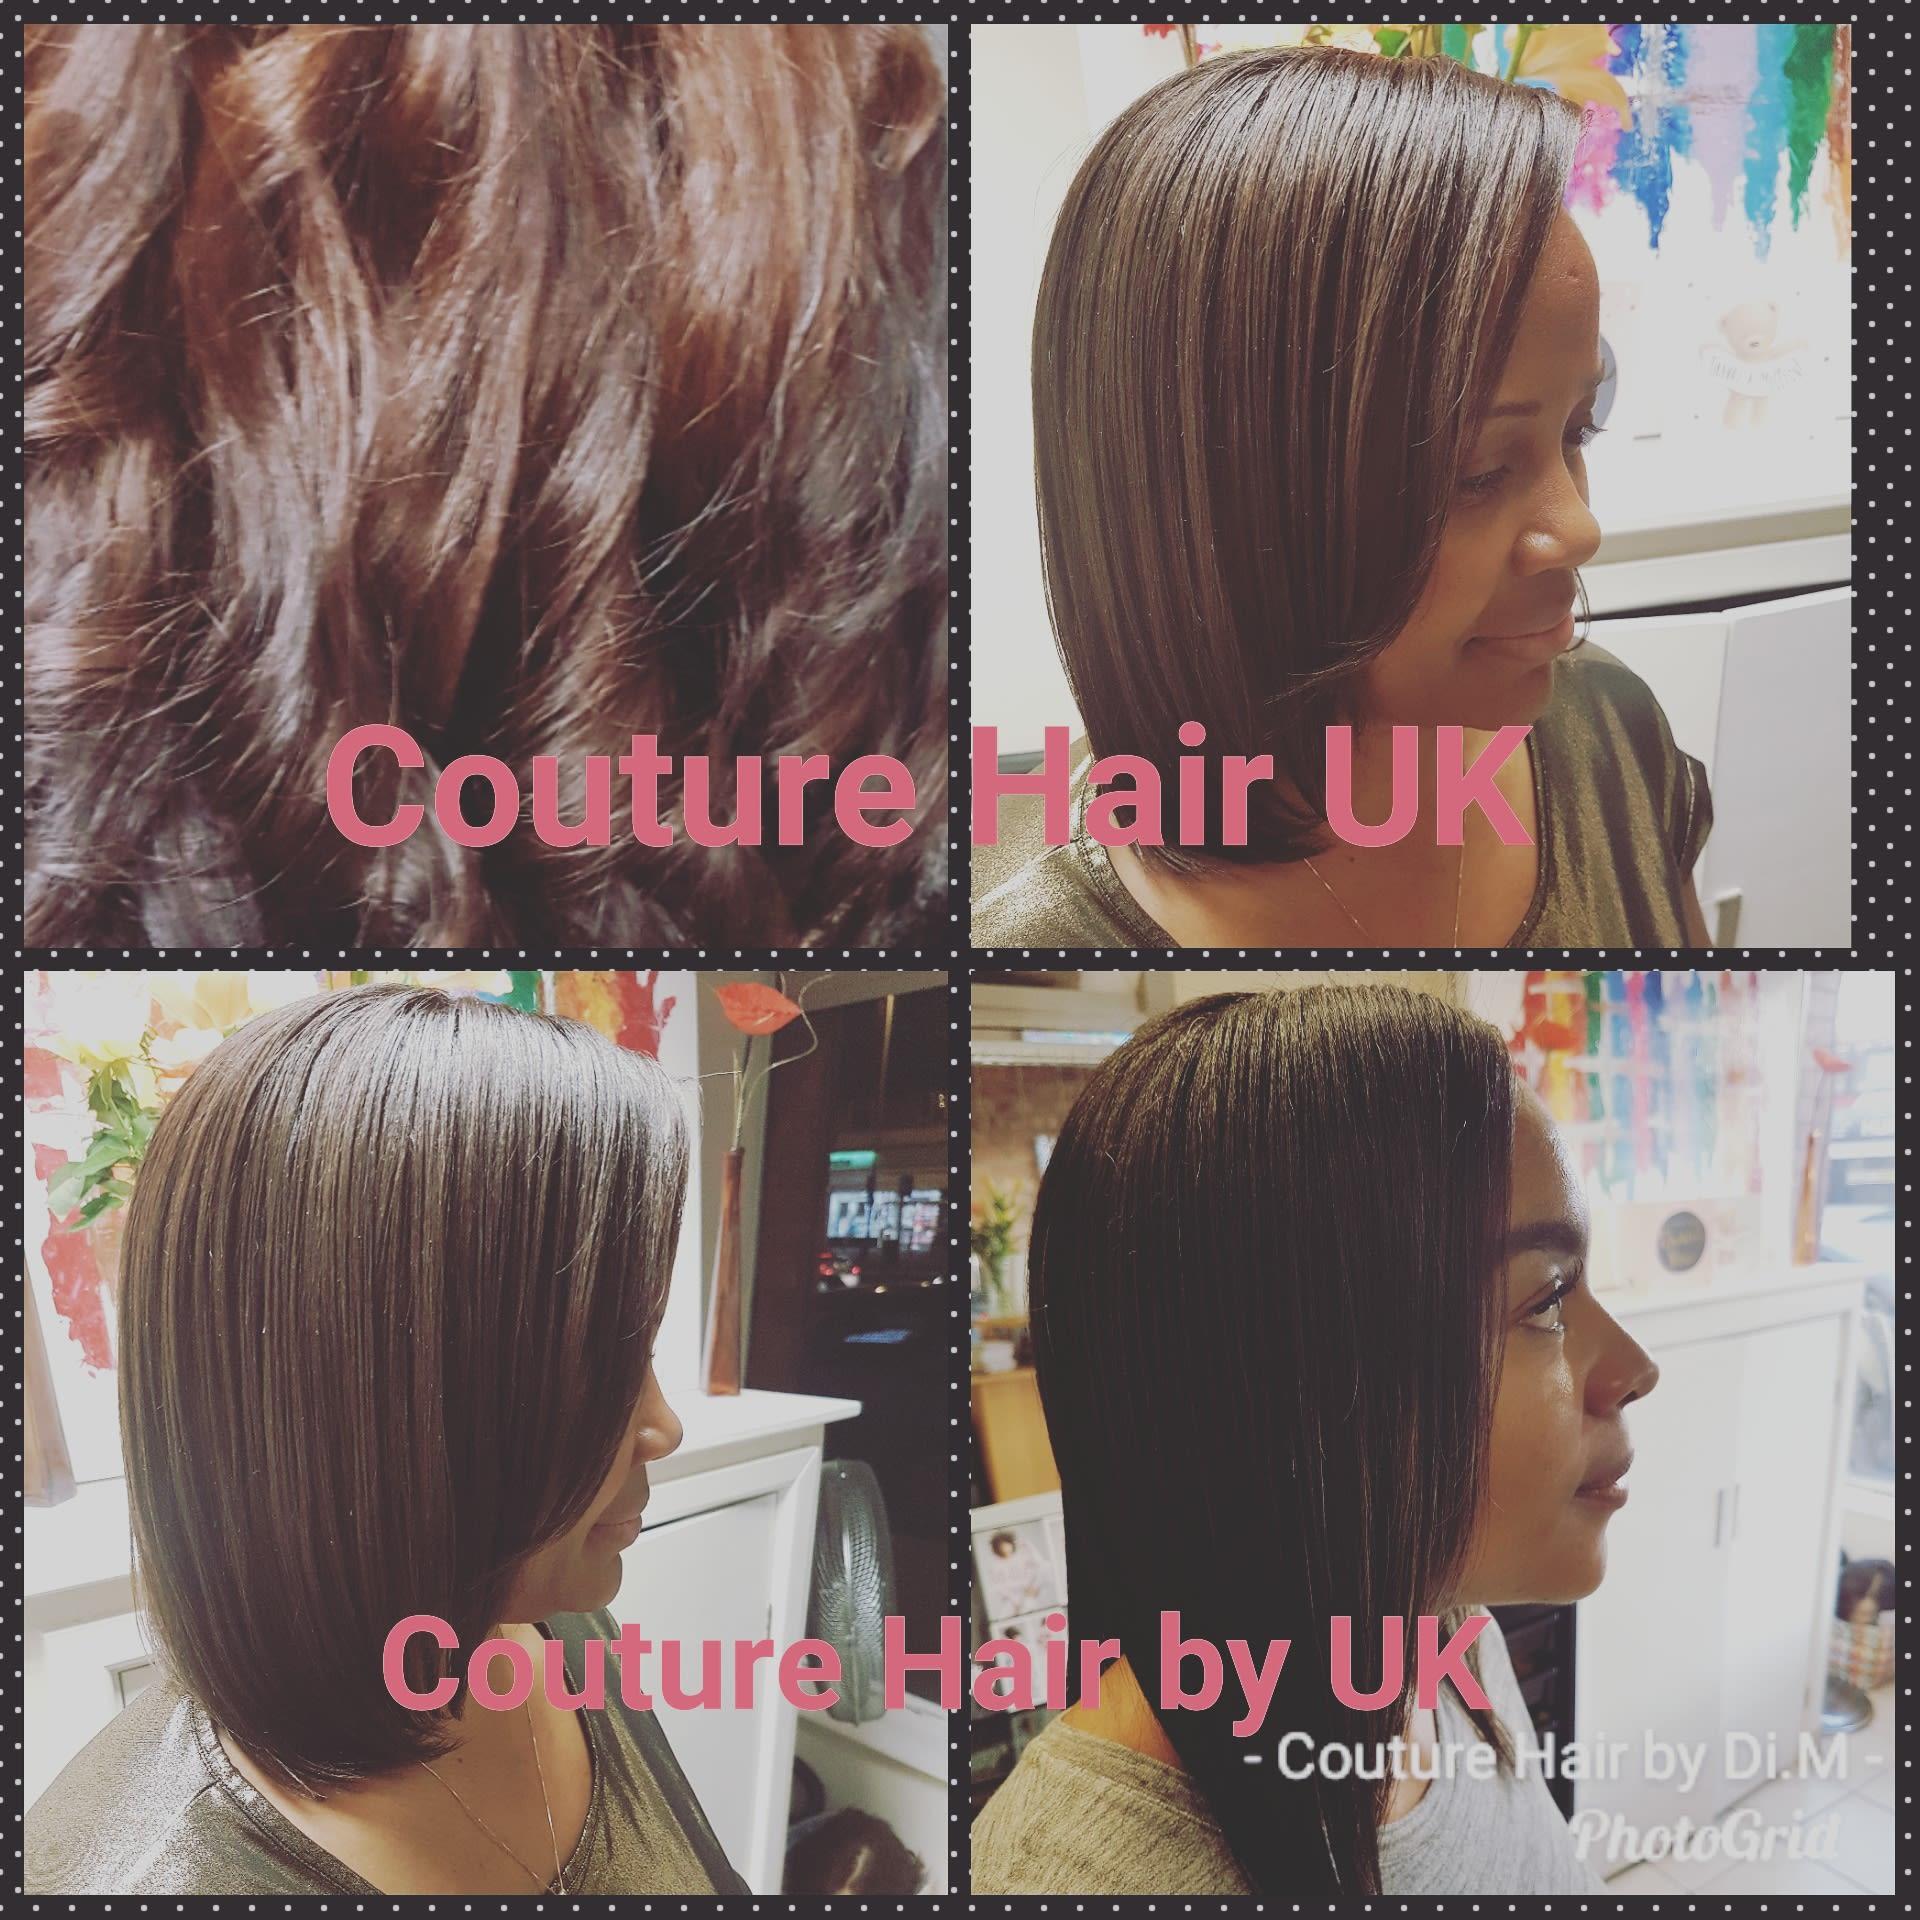 Couture Hair - Birmingham, West Midlands B42 1EH - 01213 570051 | ShowMeLocal.com